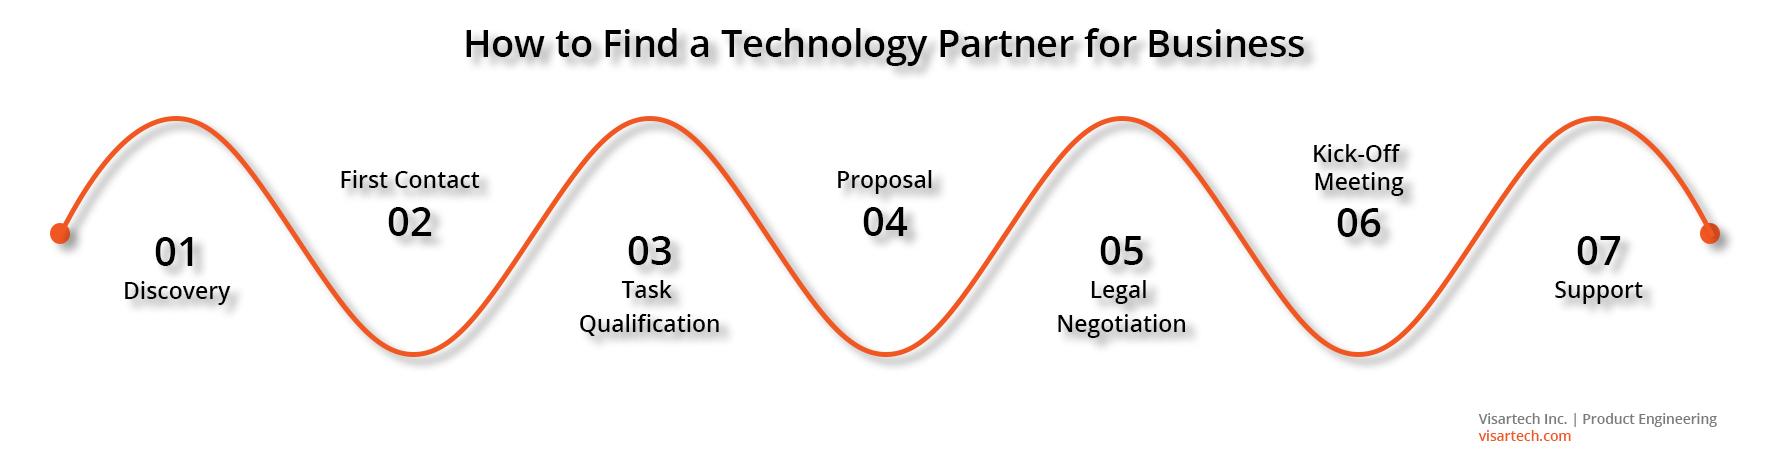 How to Find a Technology Partner for Business - Visartech Blog